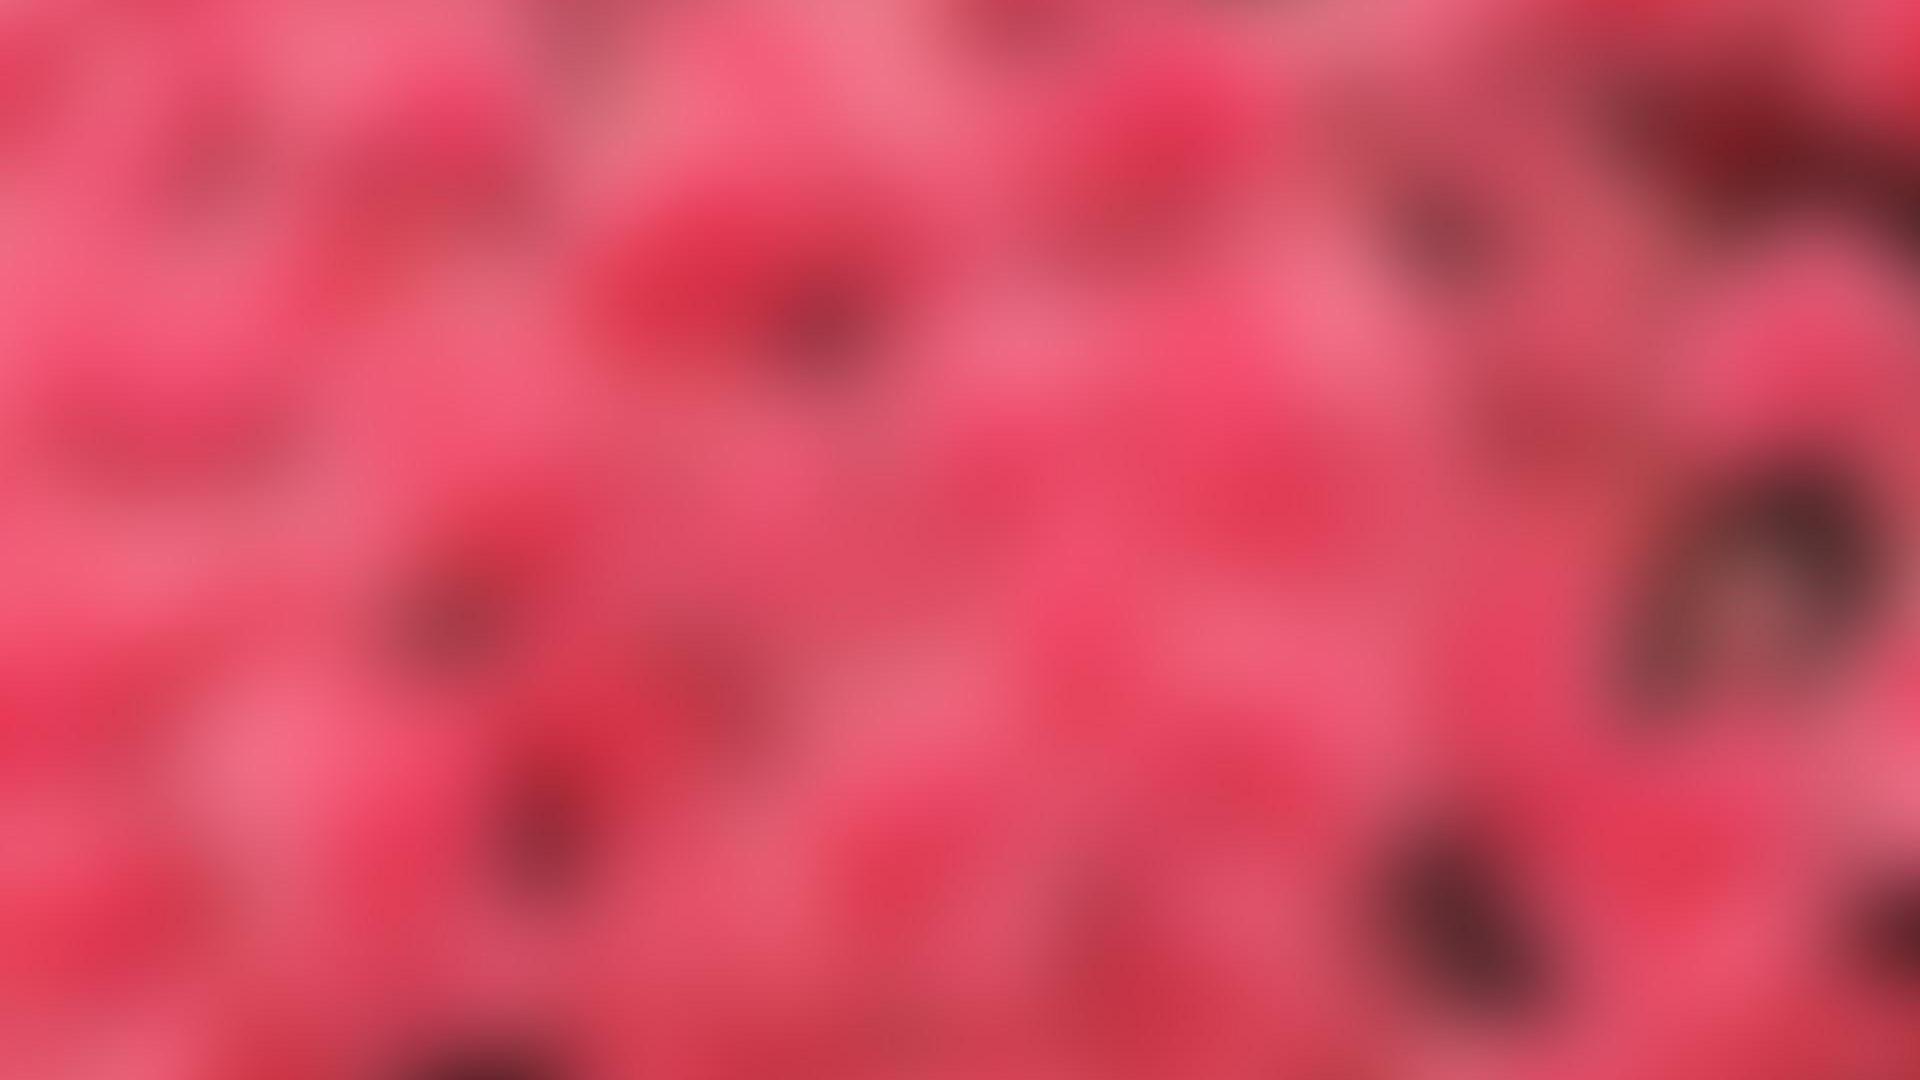 Pink Wallpaper Pink Desktop Wallpapers Desktop Wallpaper 1920x1080